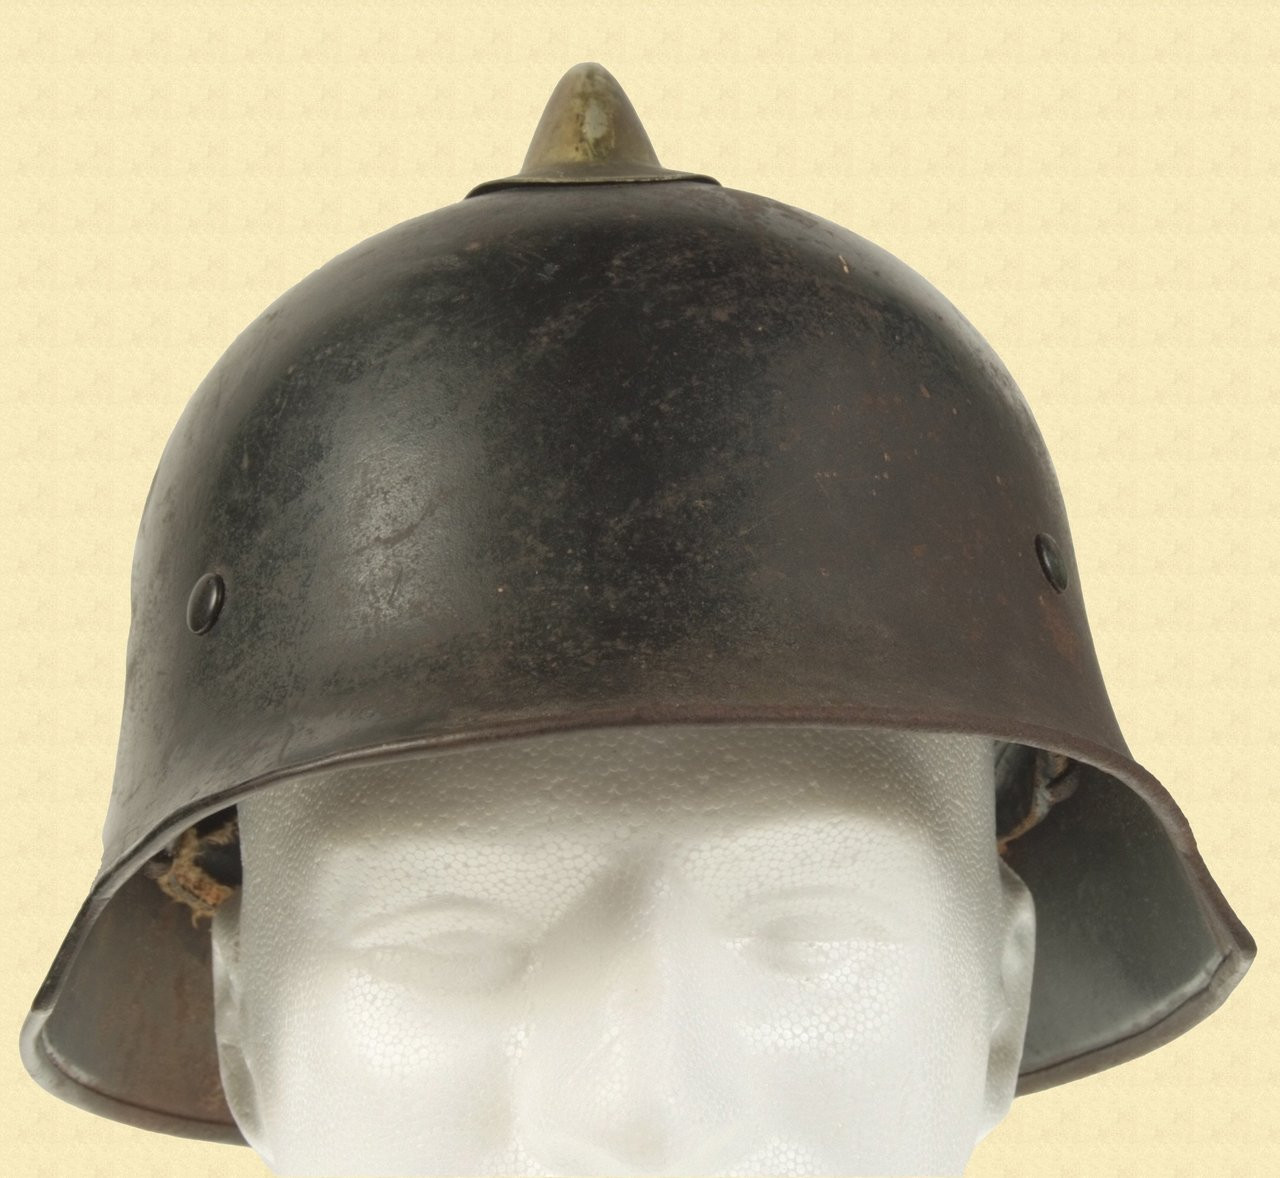 GERMAN WW2 FIREMANS HELMET - M3613